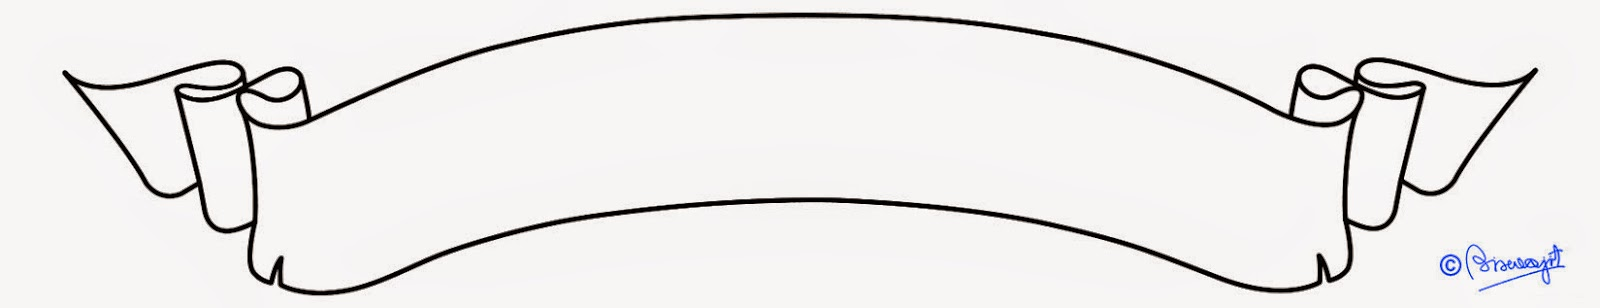 Ribbon clipart #13, Download drawings